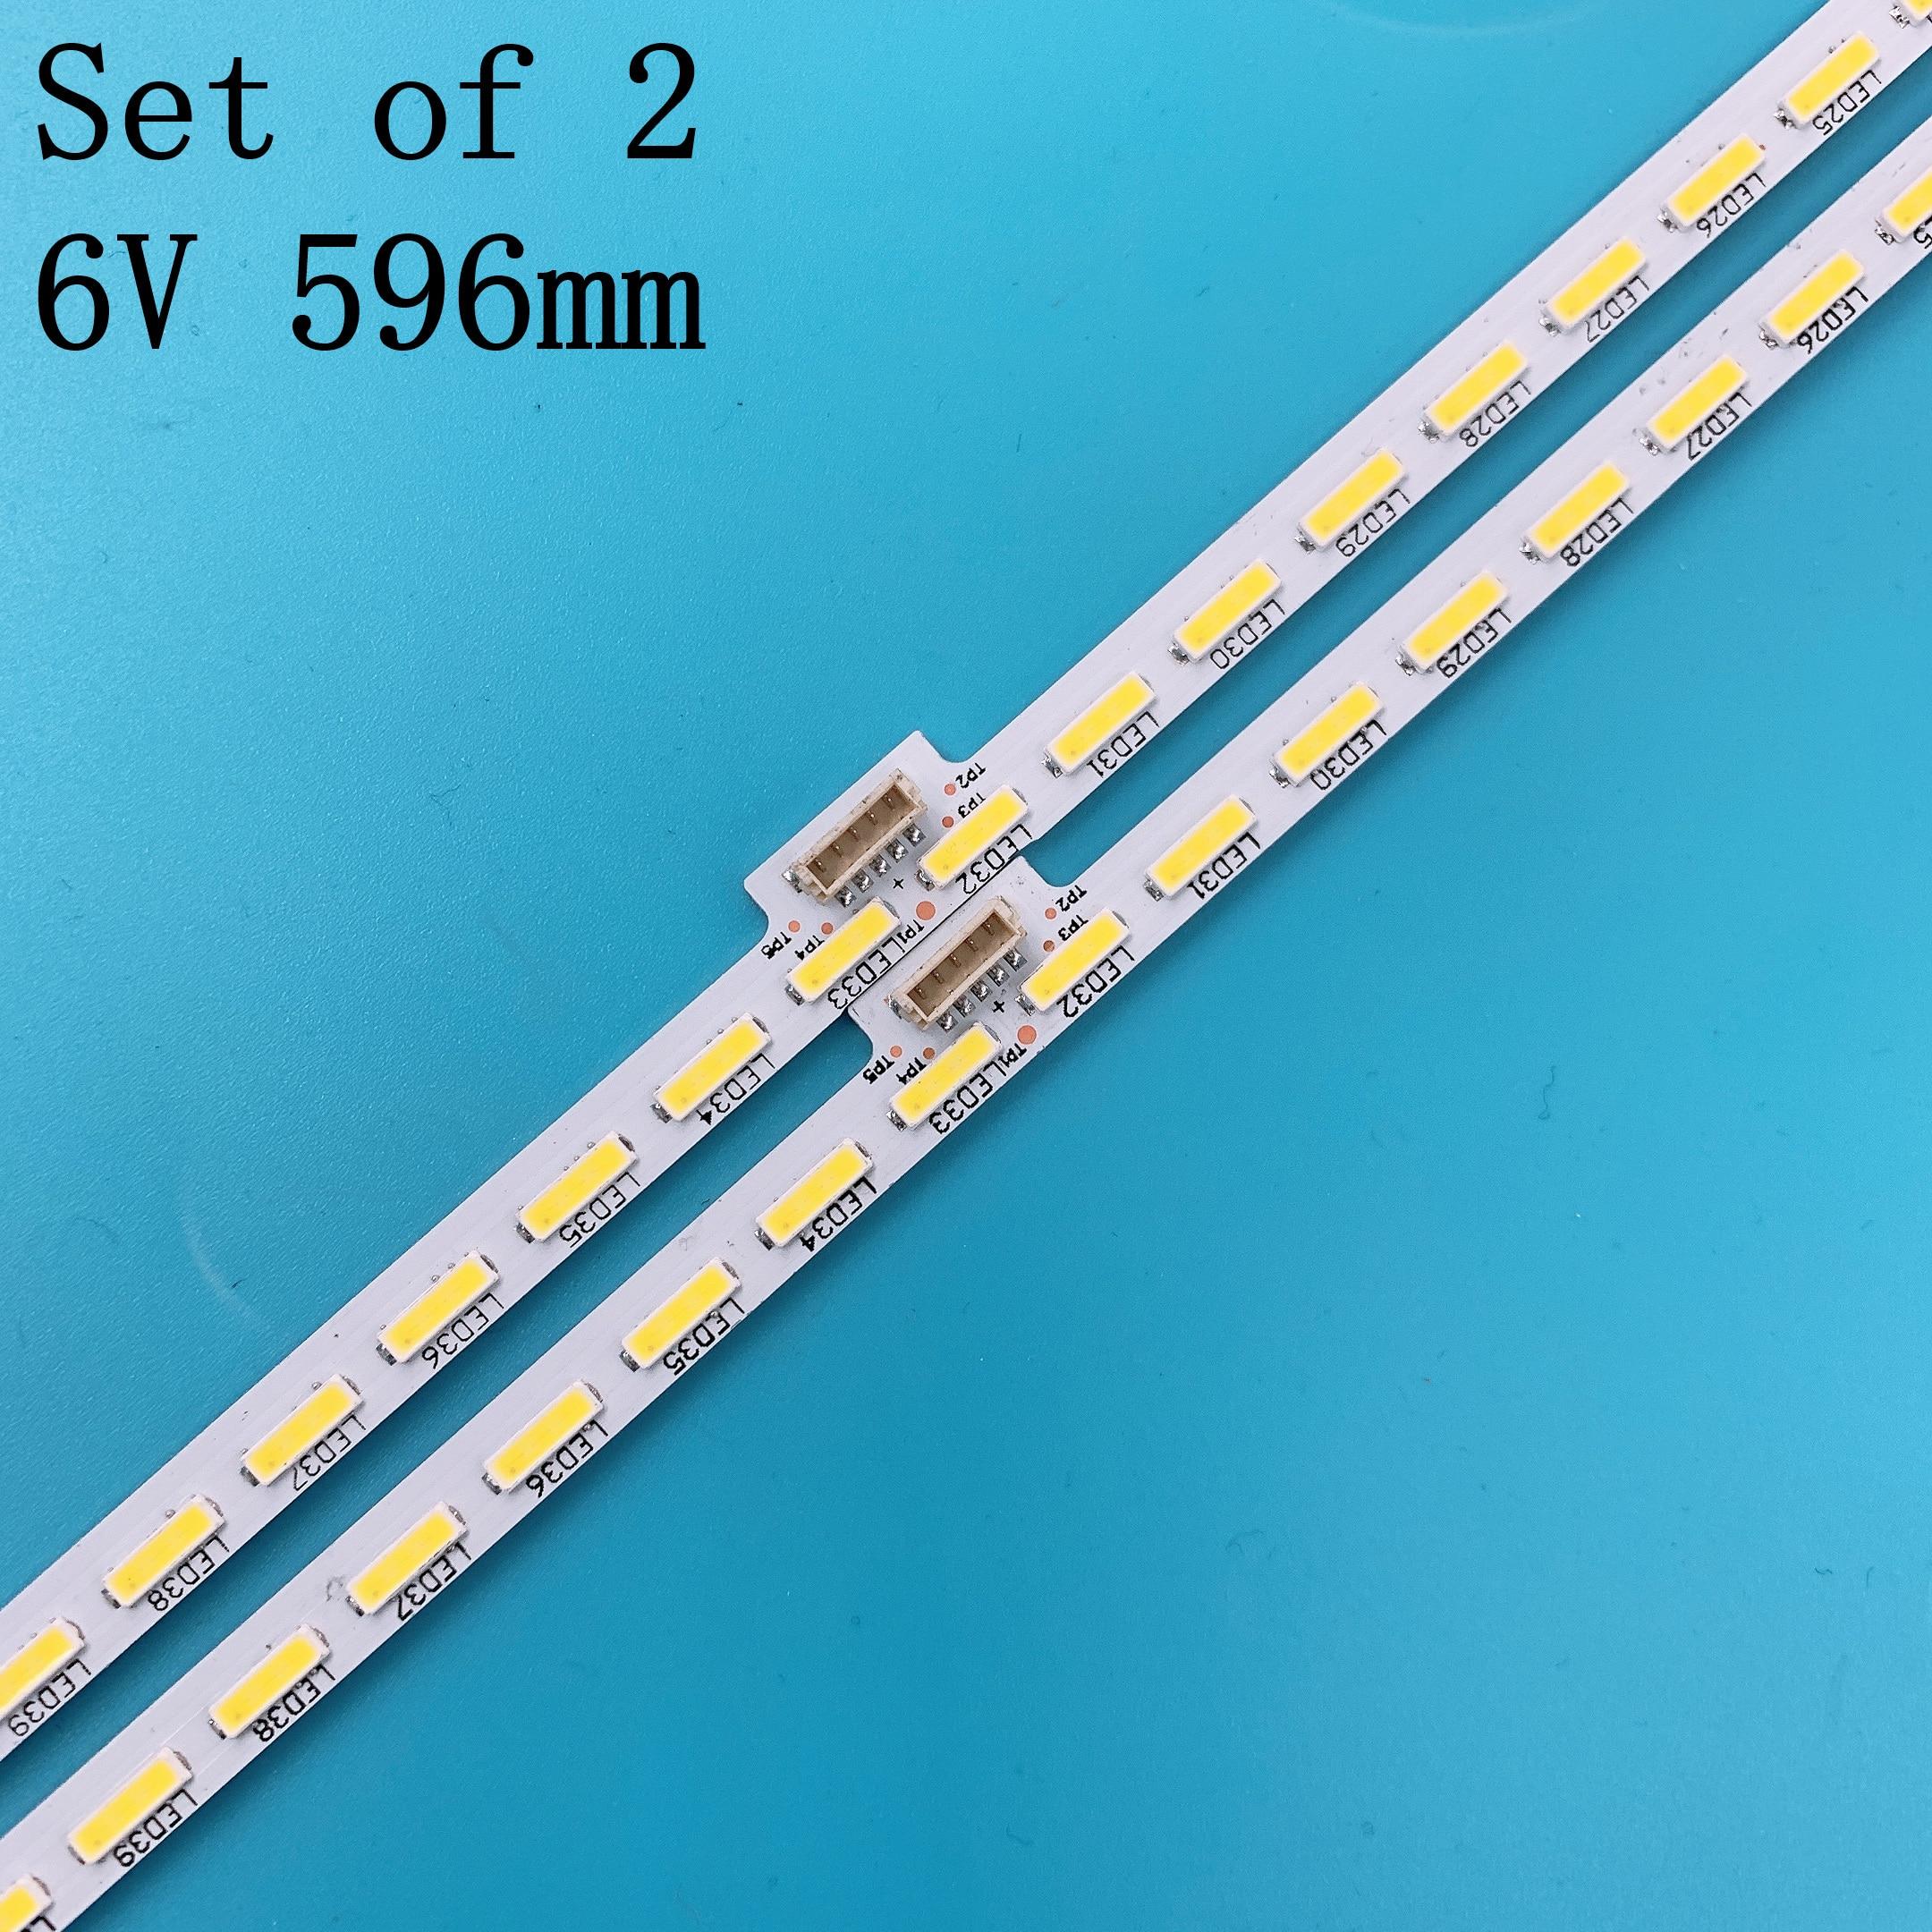 LED Backlight Strip 64 Leds For Sony Sharp YLS_HRN55_7020_REV2 V1.5 E162061 15521N SYV5541 KD-55X8500D KD-55X8505C KD-55X8508C